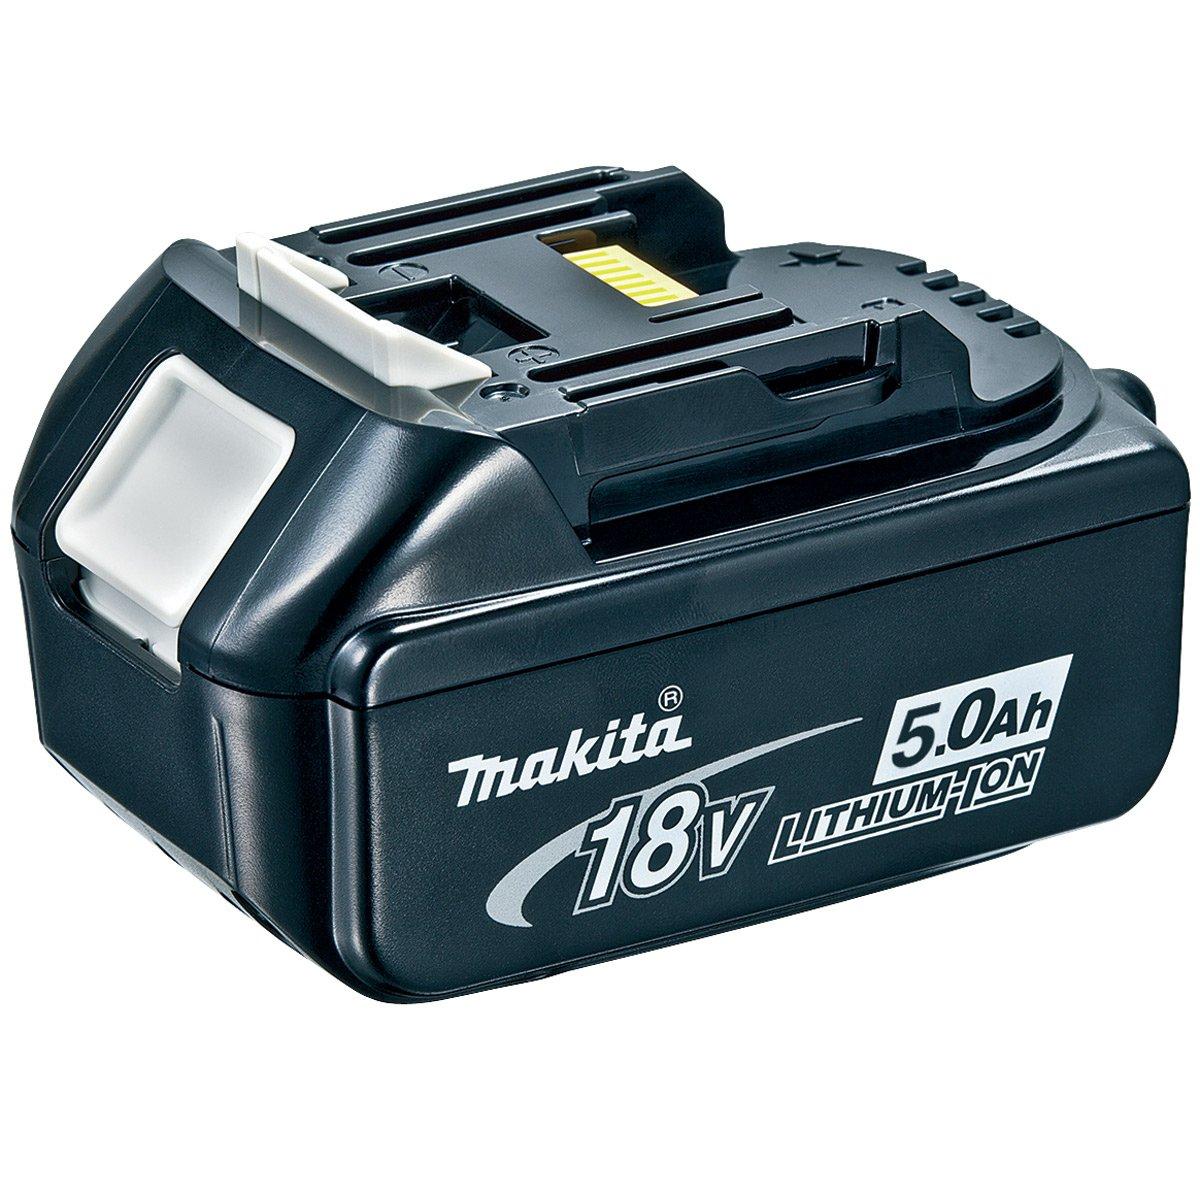 Makita BL1850 (196673-6) 18 Volt 5Ah Lithium-Ion Battery, 18 V, Black, Small